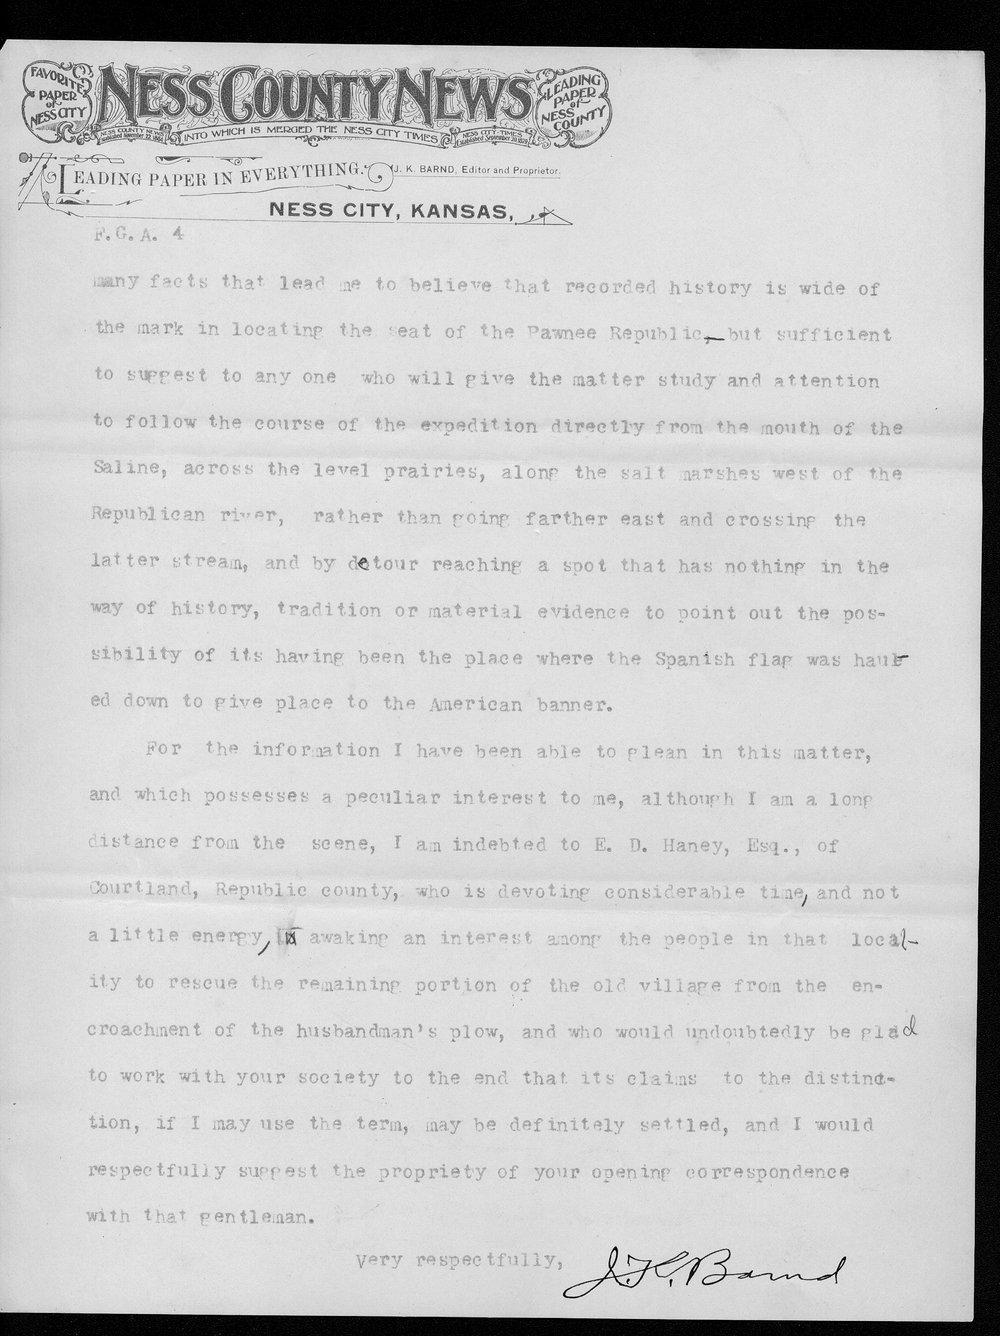 J.K. Barnd to Franklin G. Adams - 4